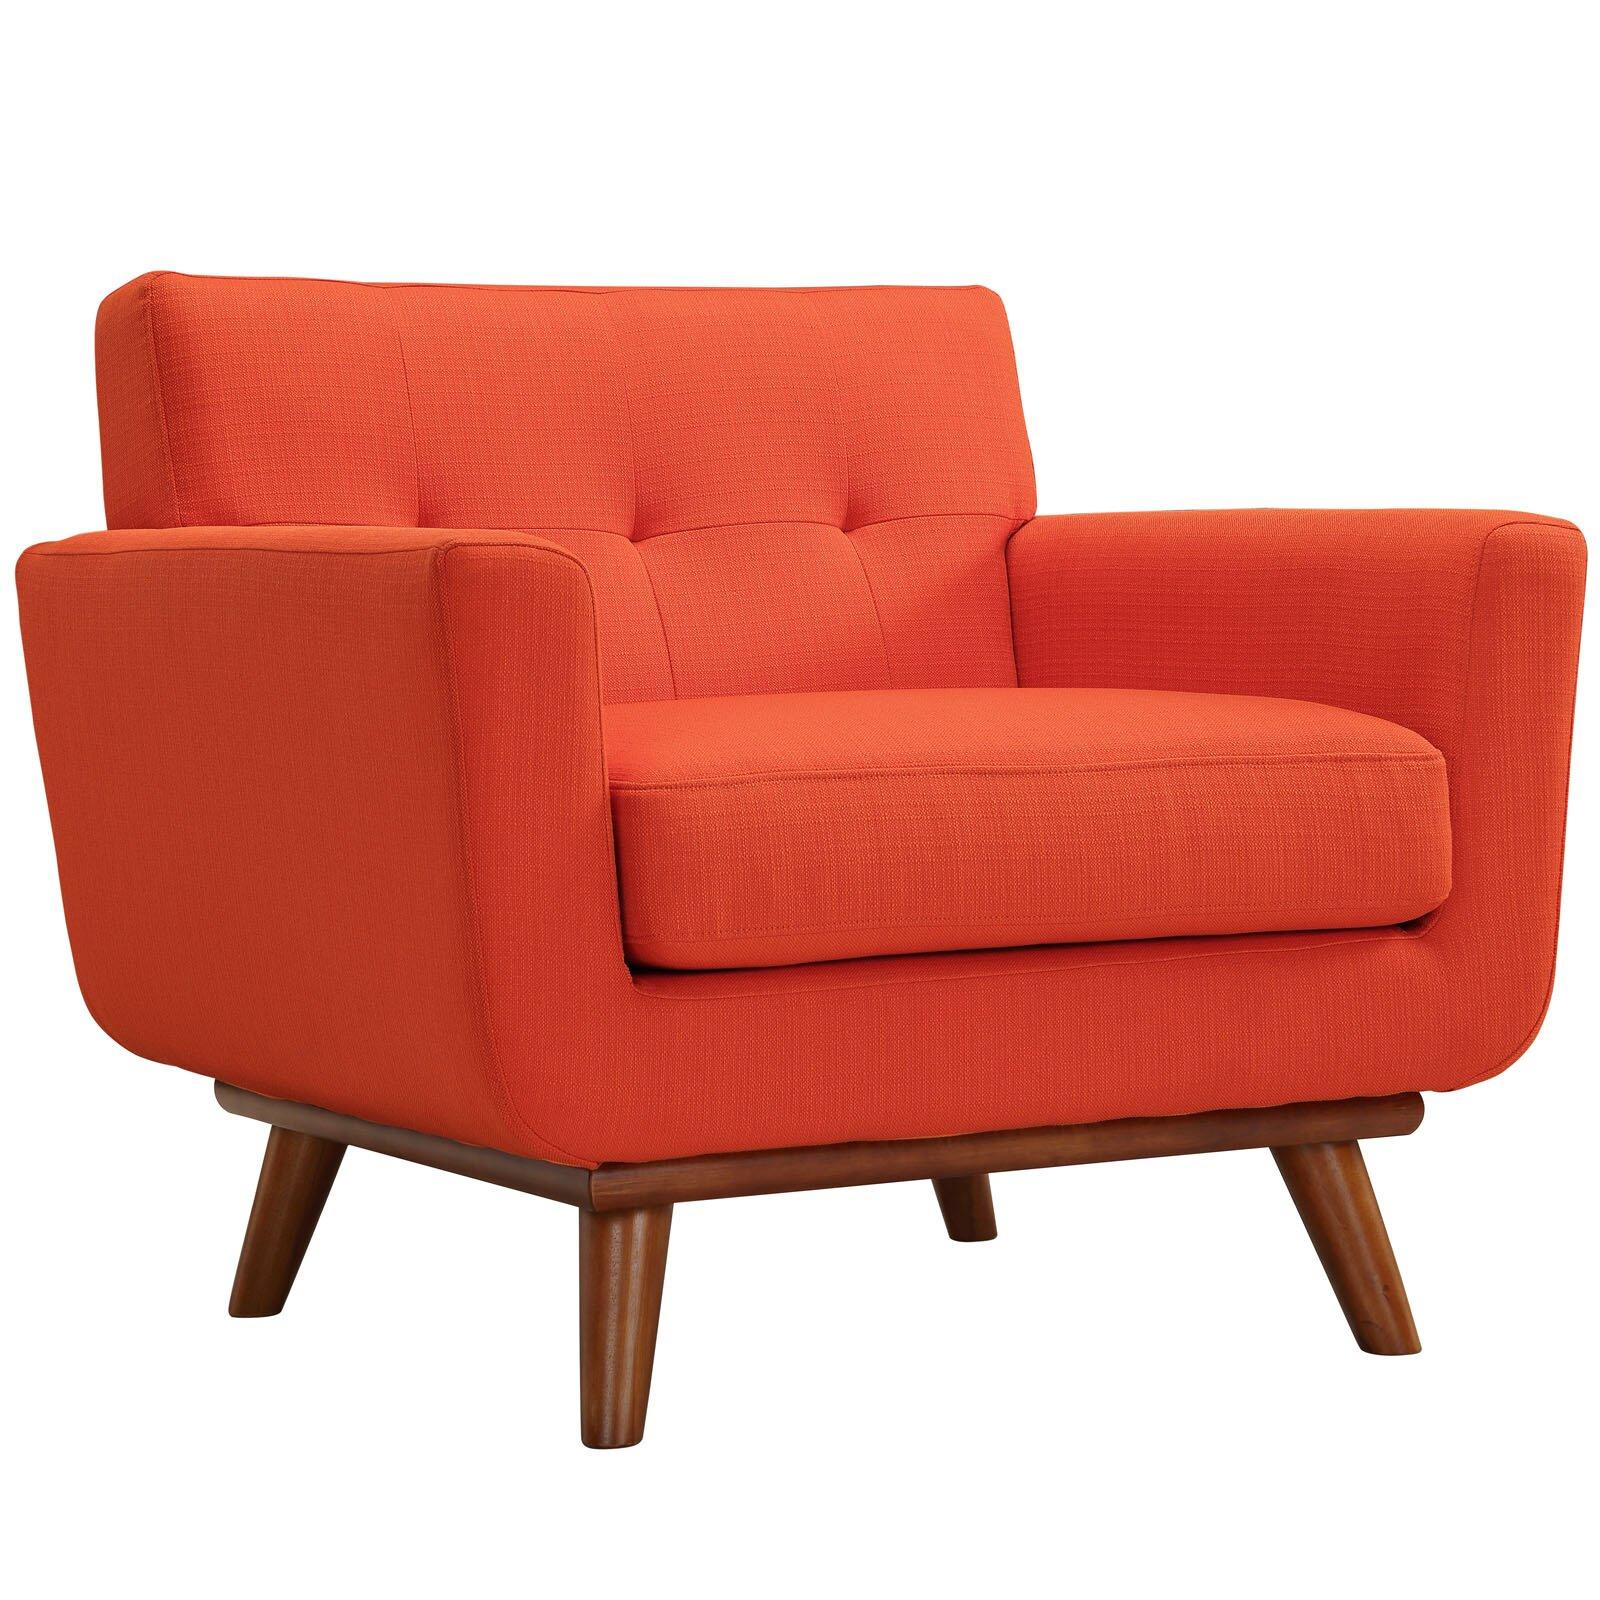 Corrigan Studio Saginaw Arm Chair And Loveseat Set Reviews Wayfair